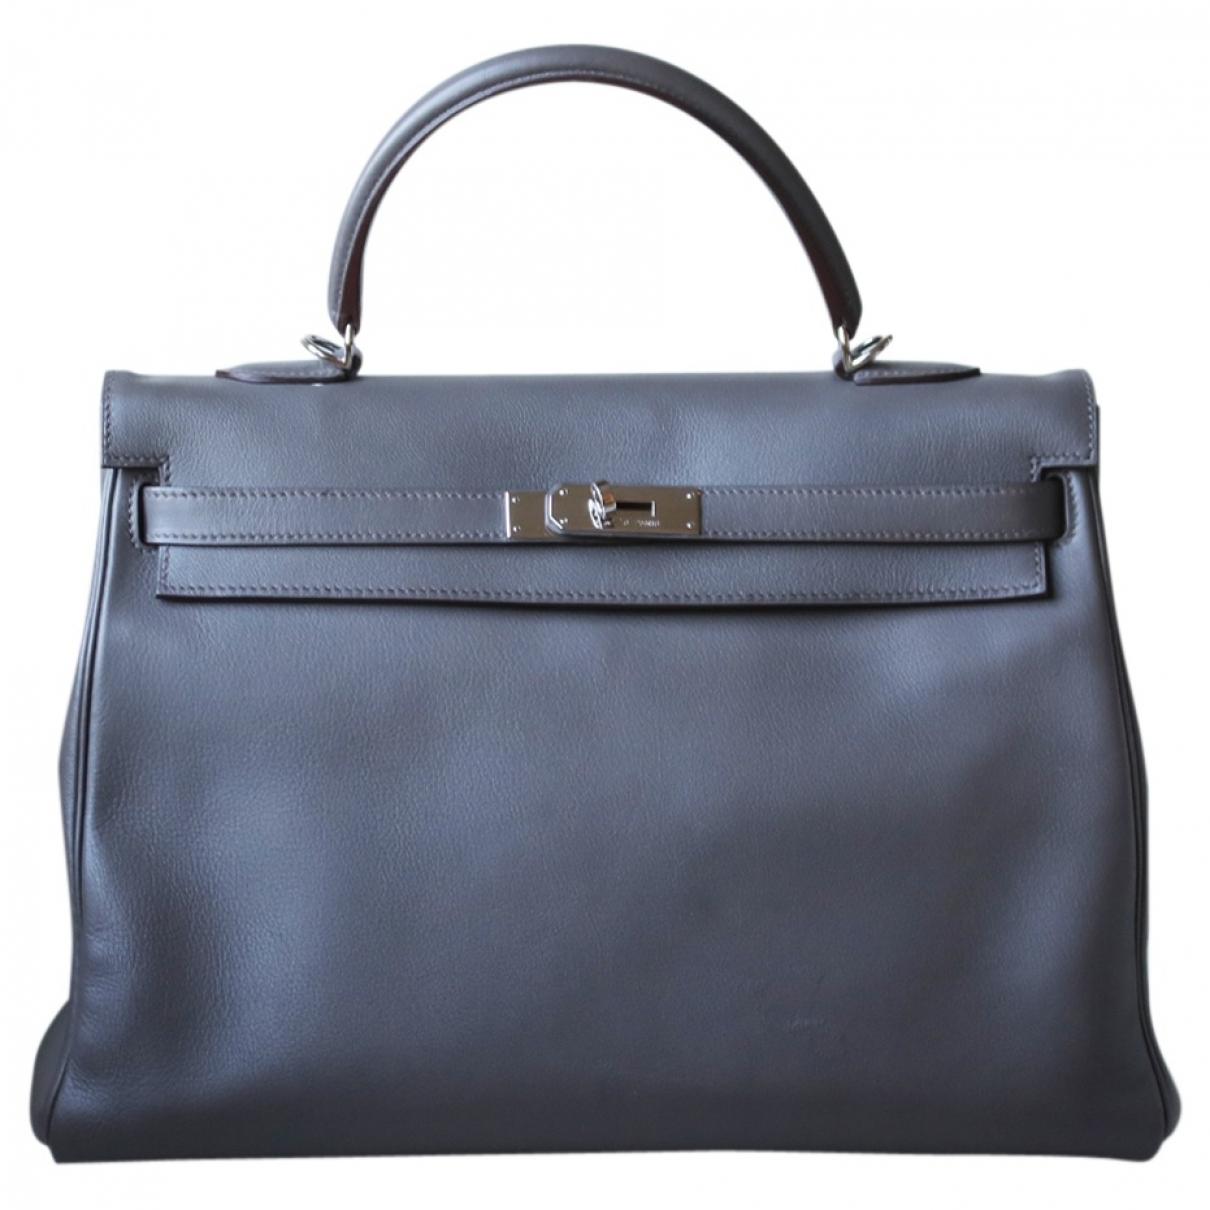 Hermes Kelly 35 Handtasche in  Grau Leder